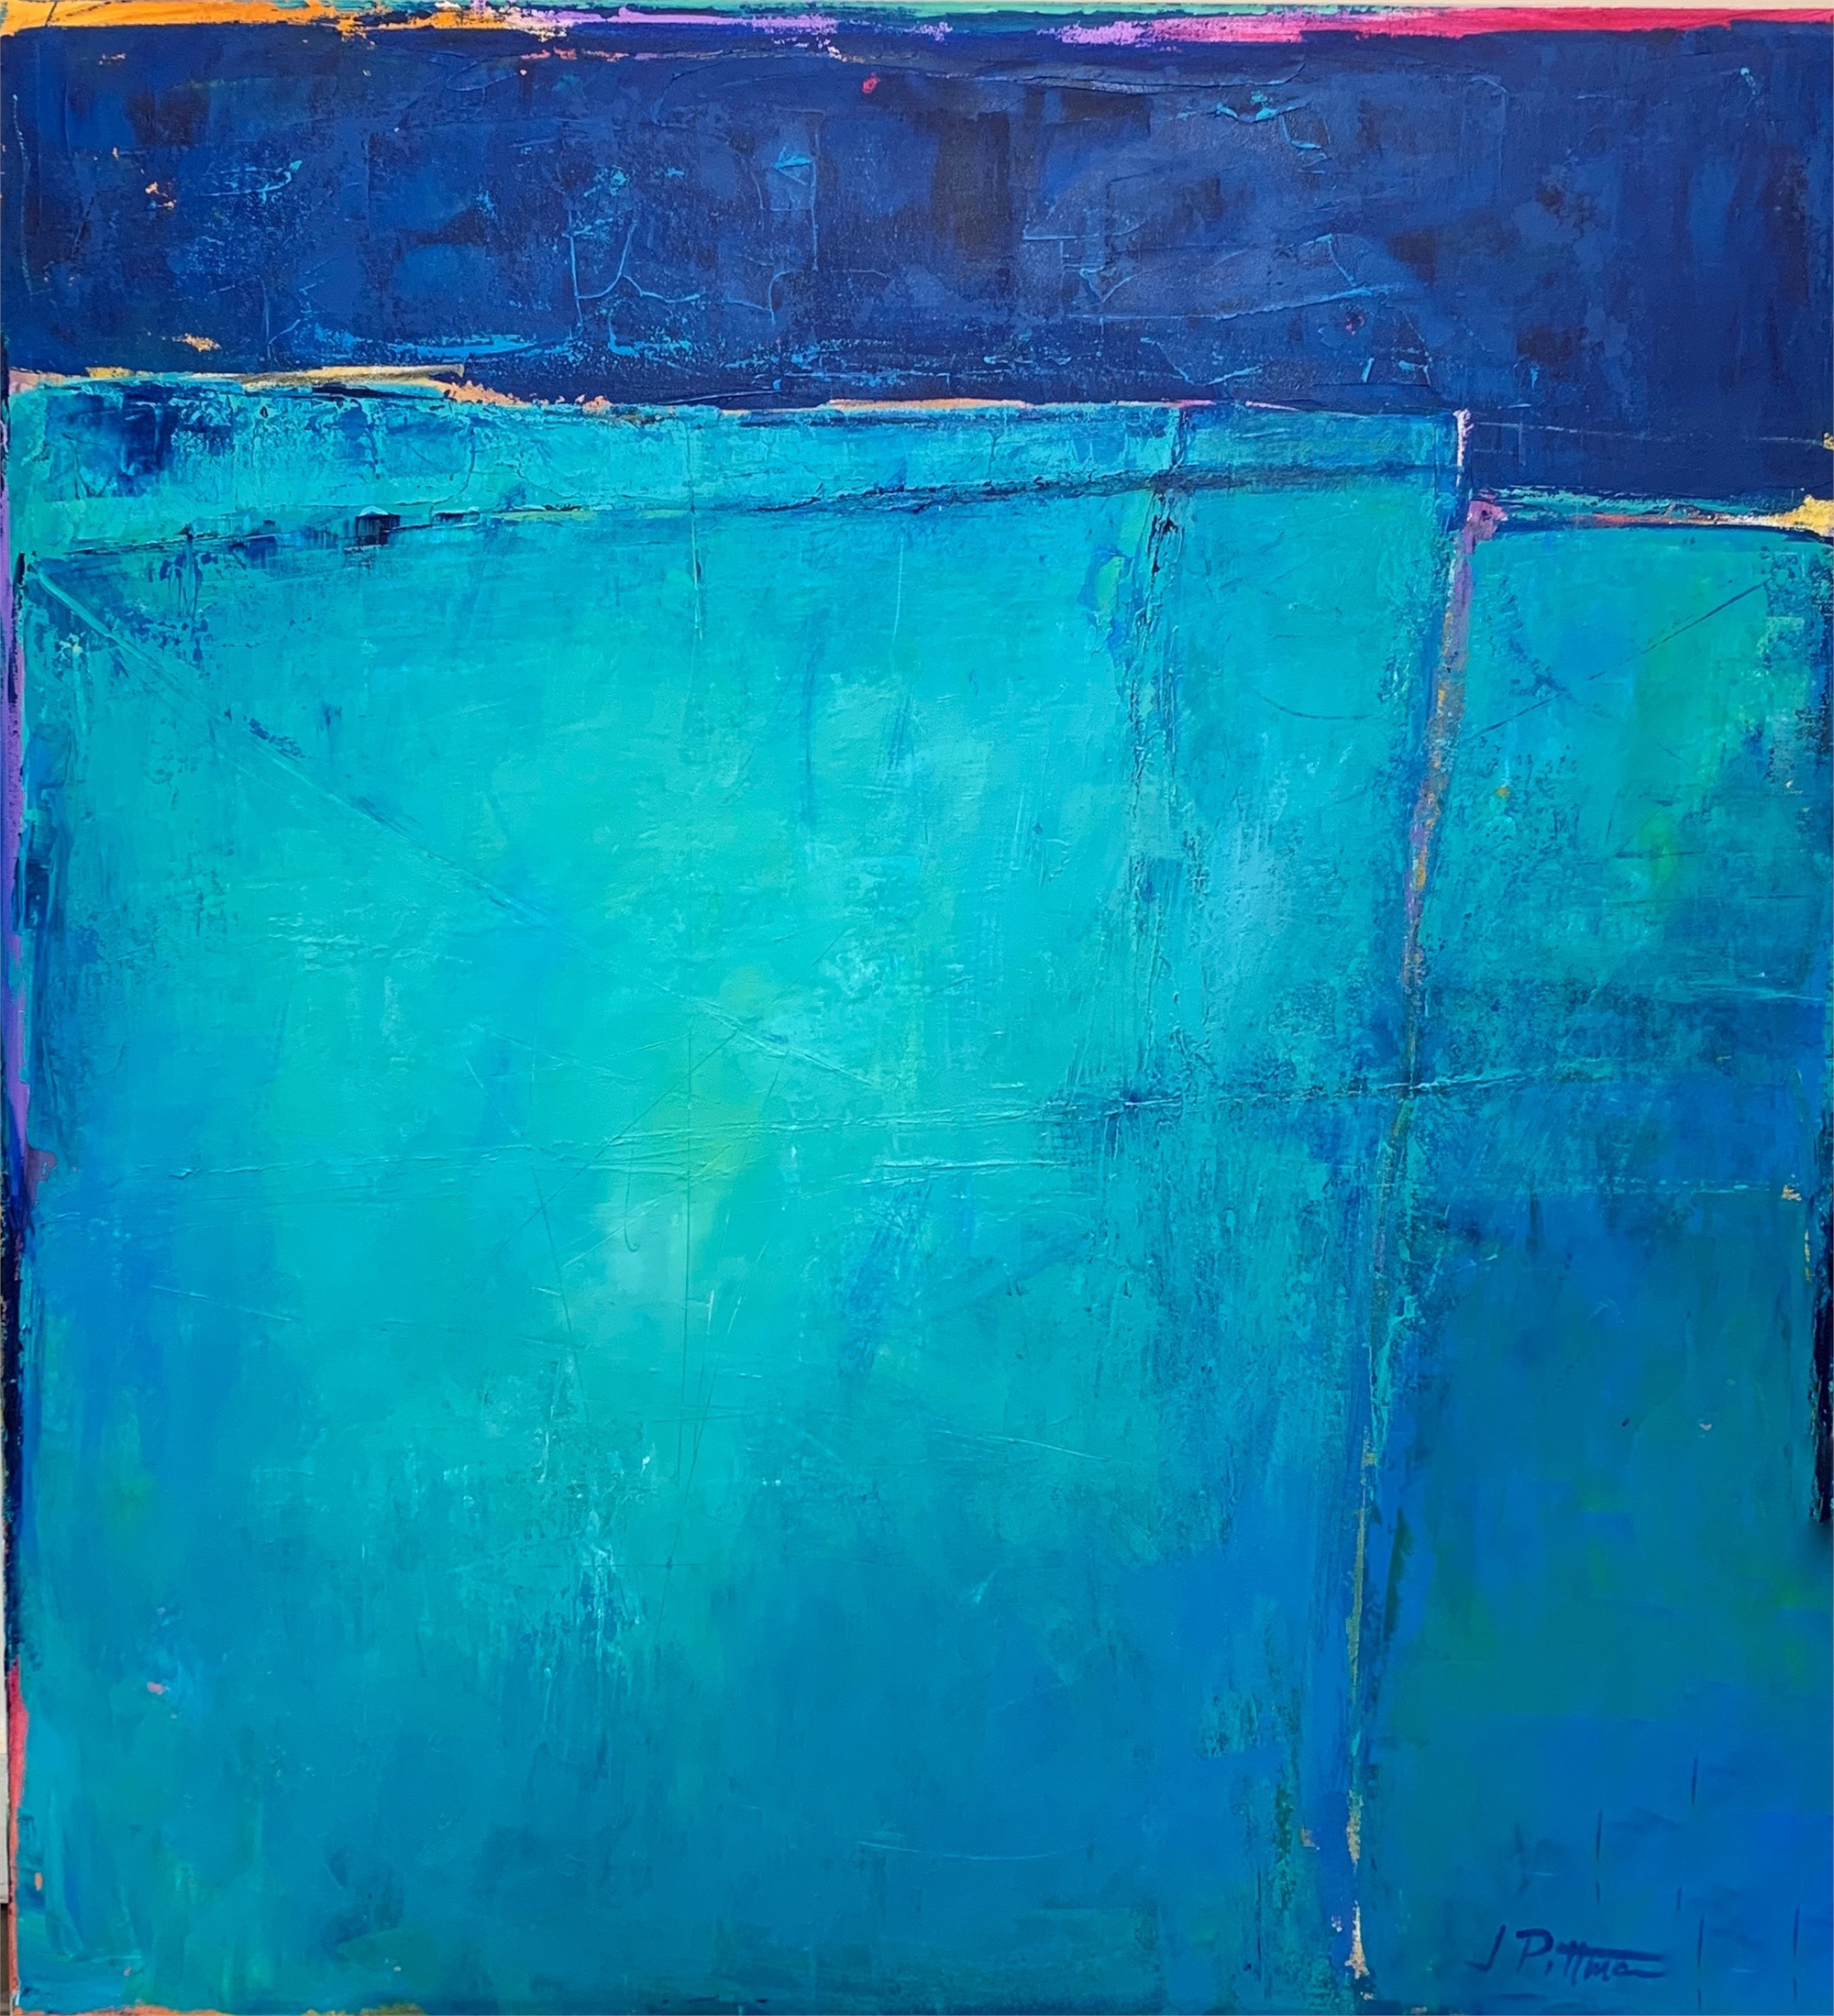 Open Space by Jim Pittman